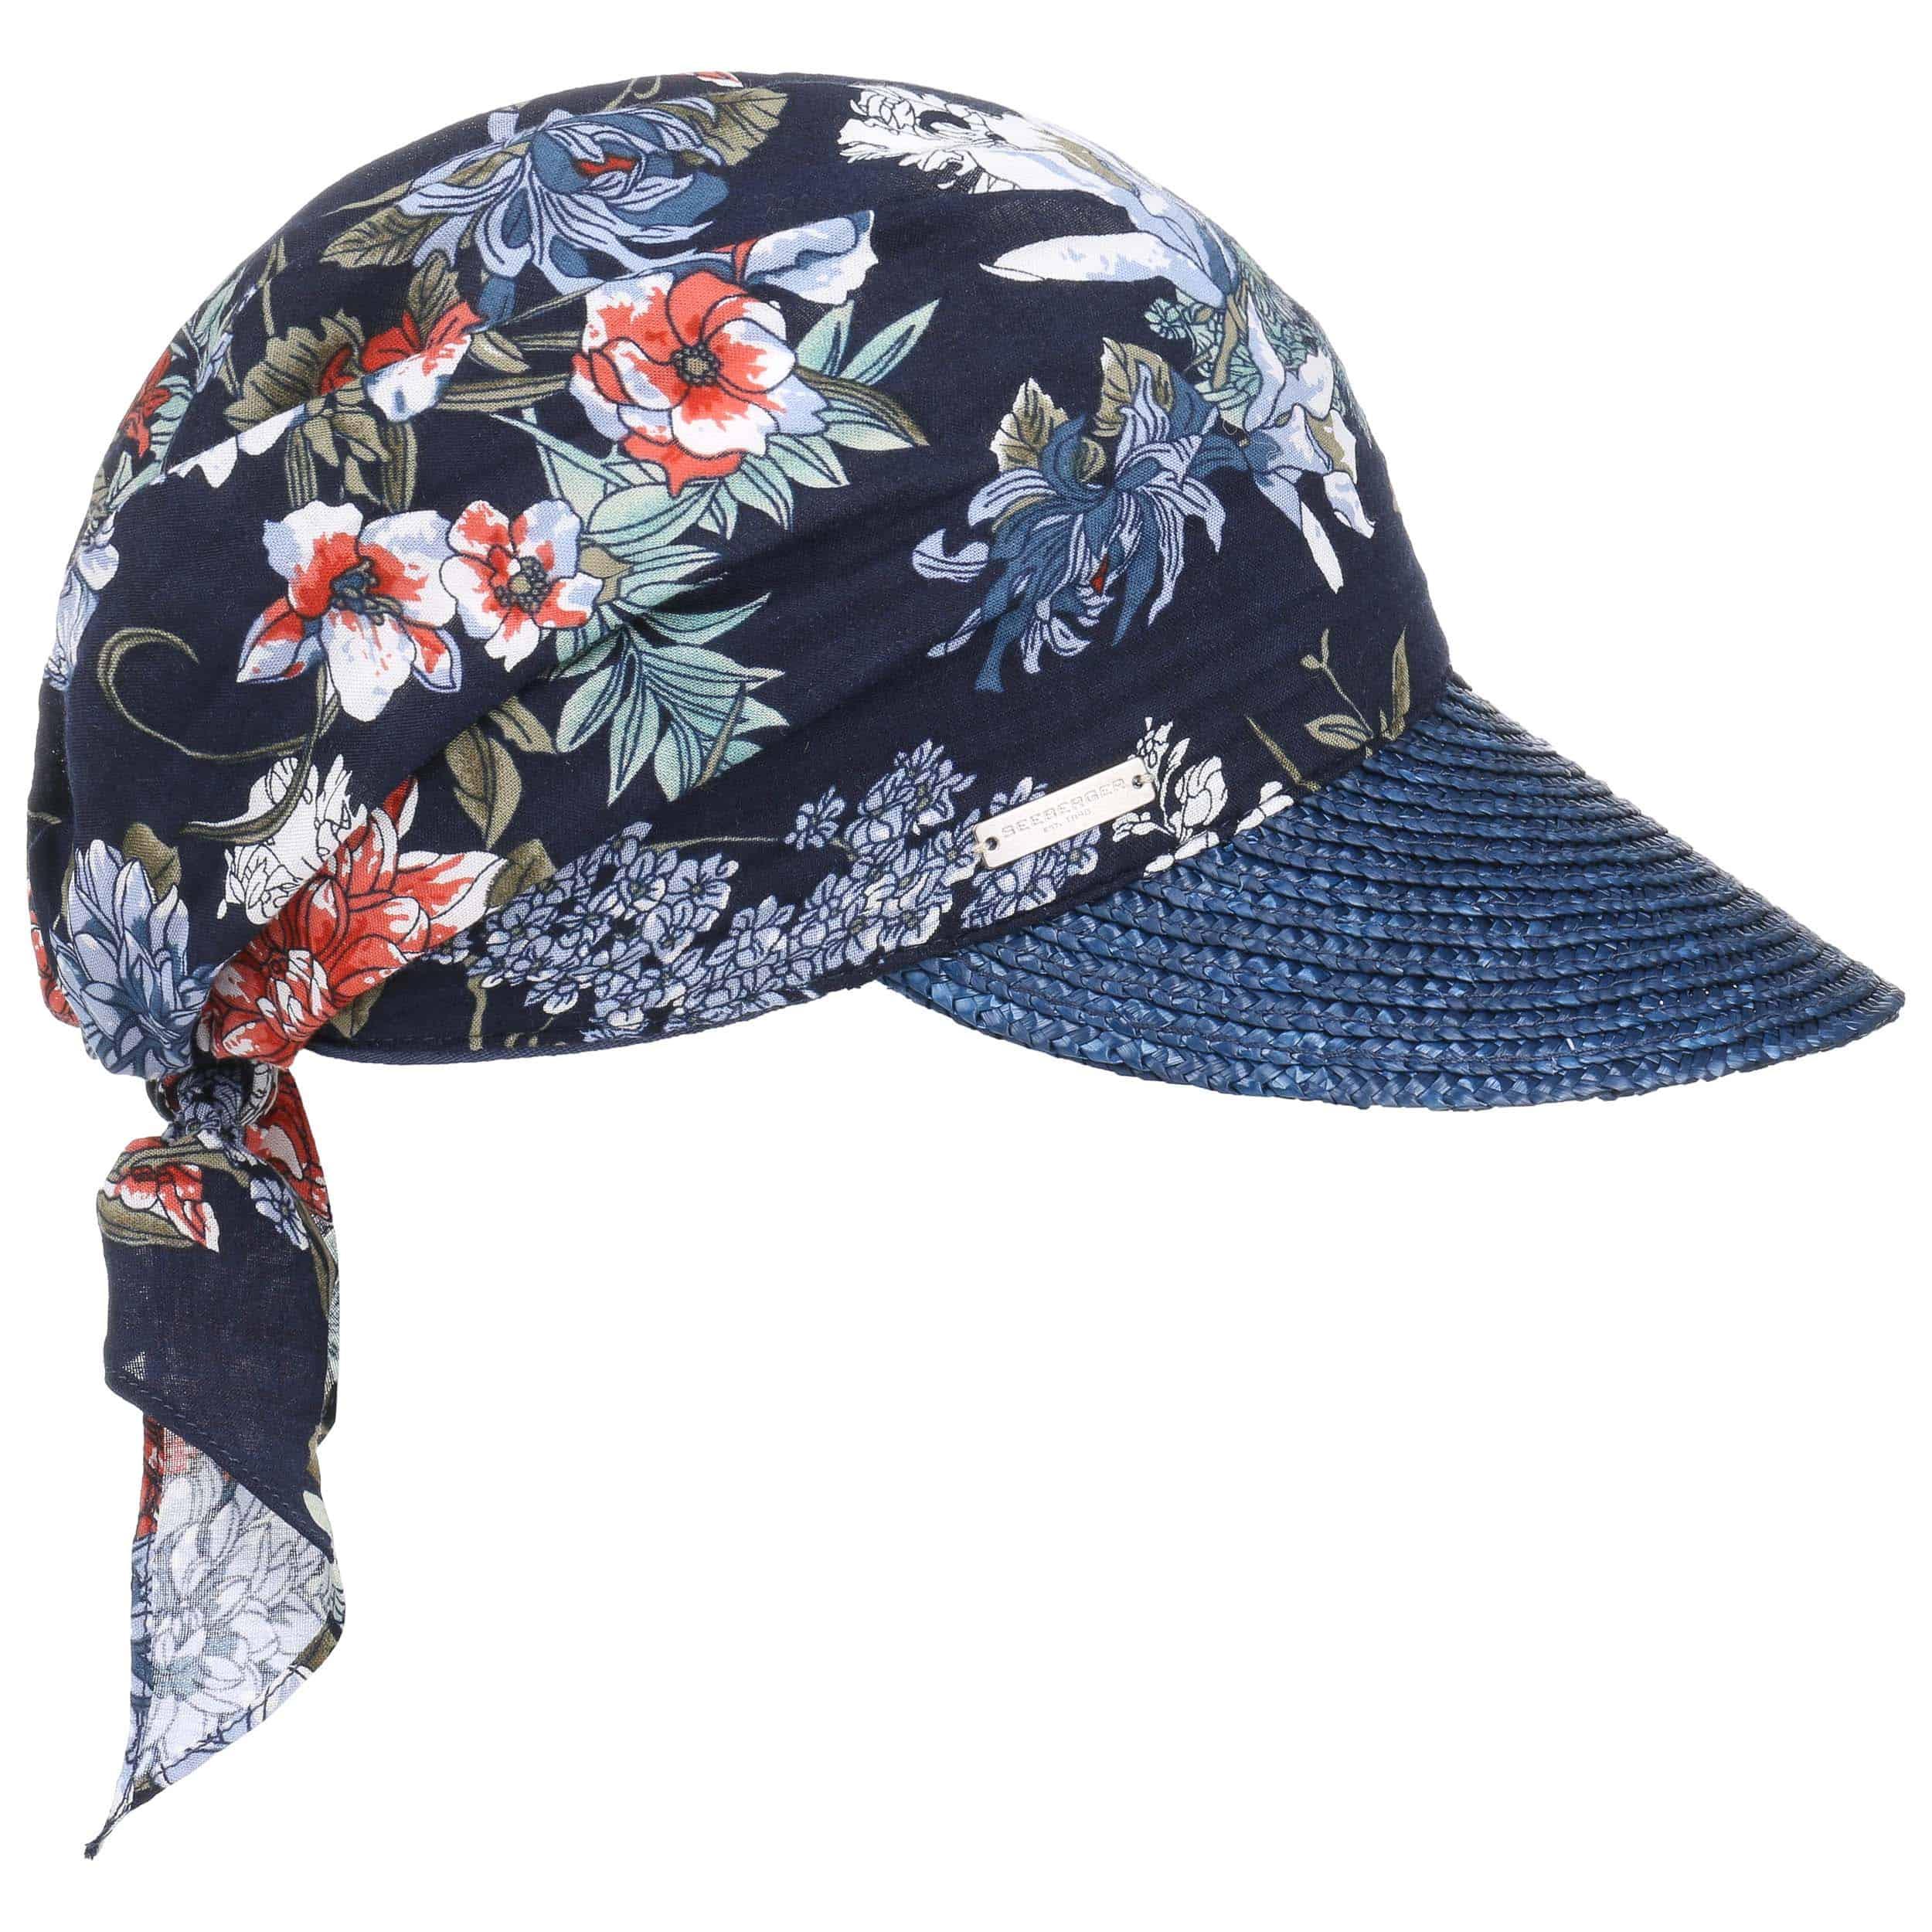 Gorra Flower High UV Bandana by Seeberger - Bandanas - sombreroshop.es 5ca0dfd99ed